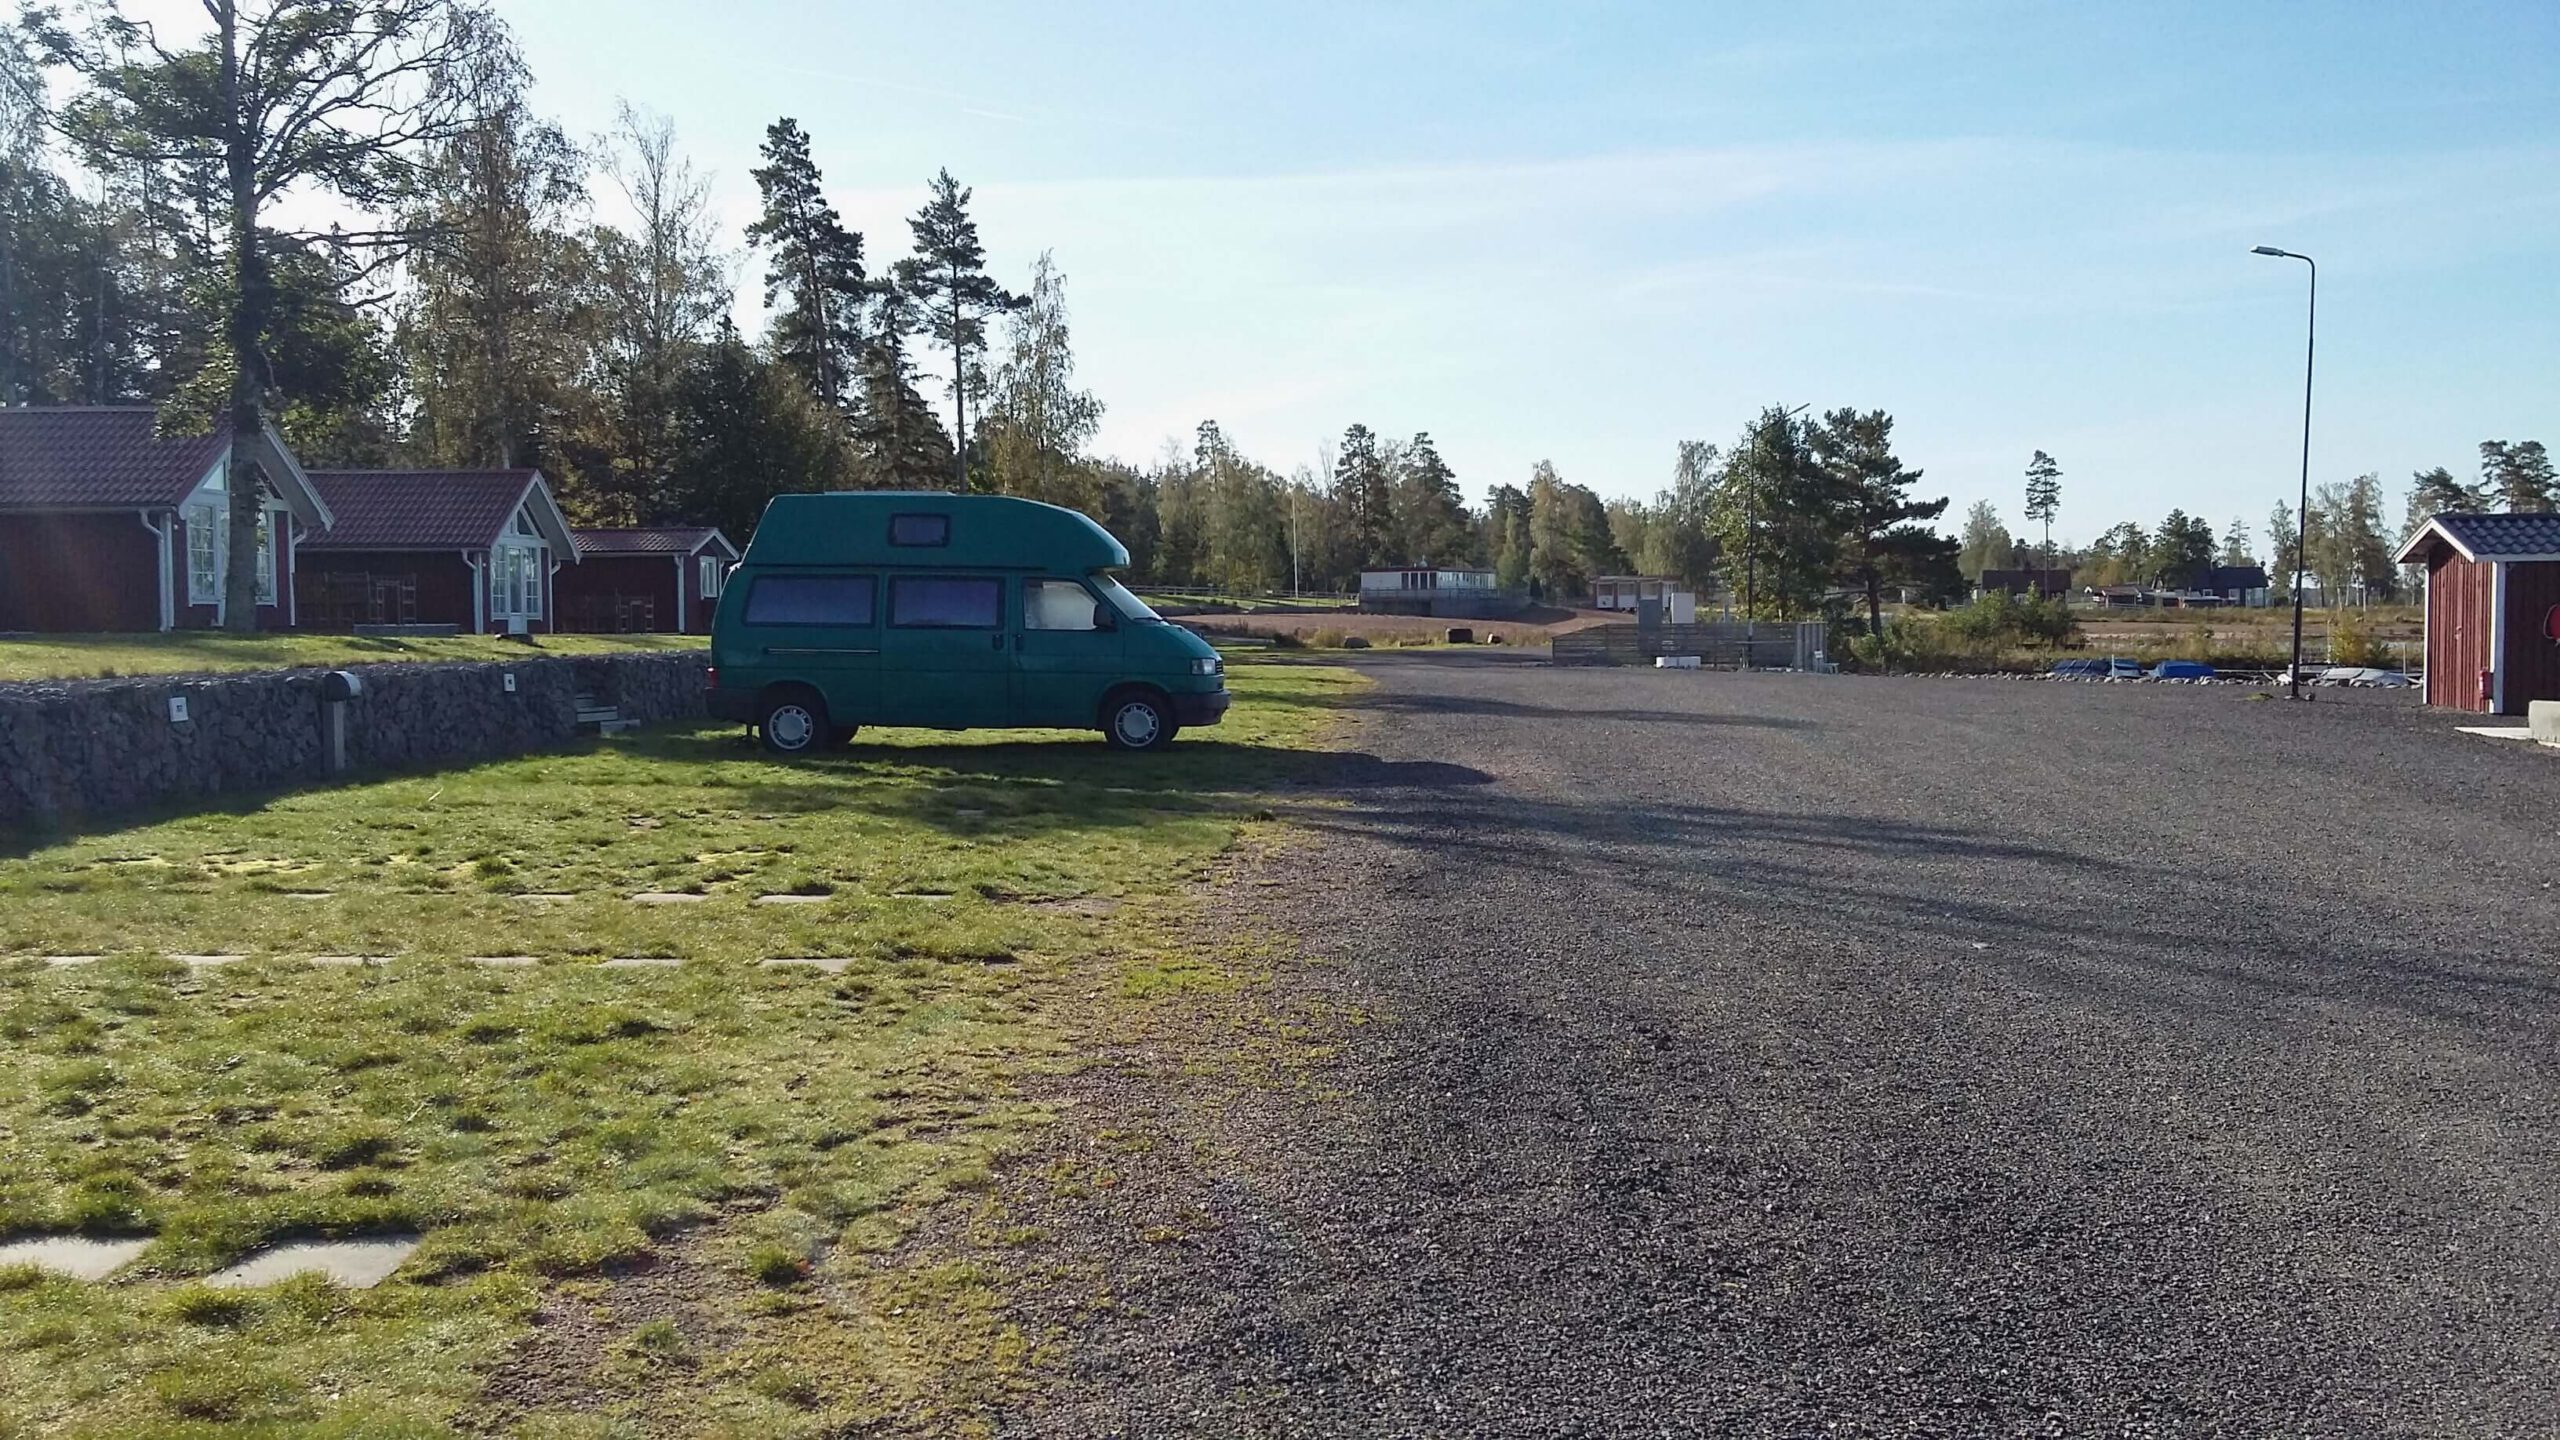 VW Bus T4 Manfred California gruen Camper Bulli mieten Rostock bincampen überall Zuhause